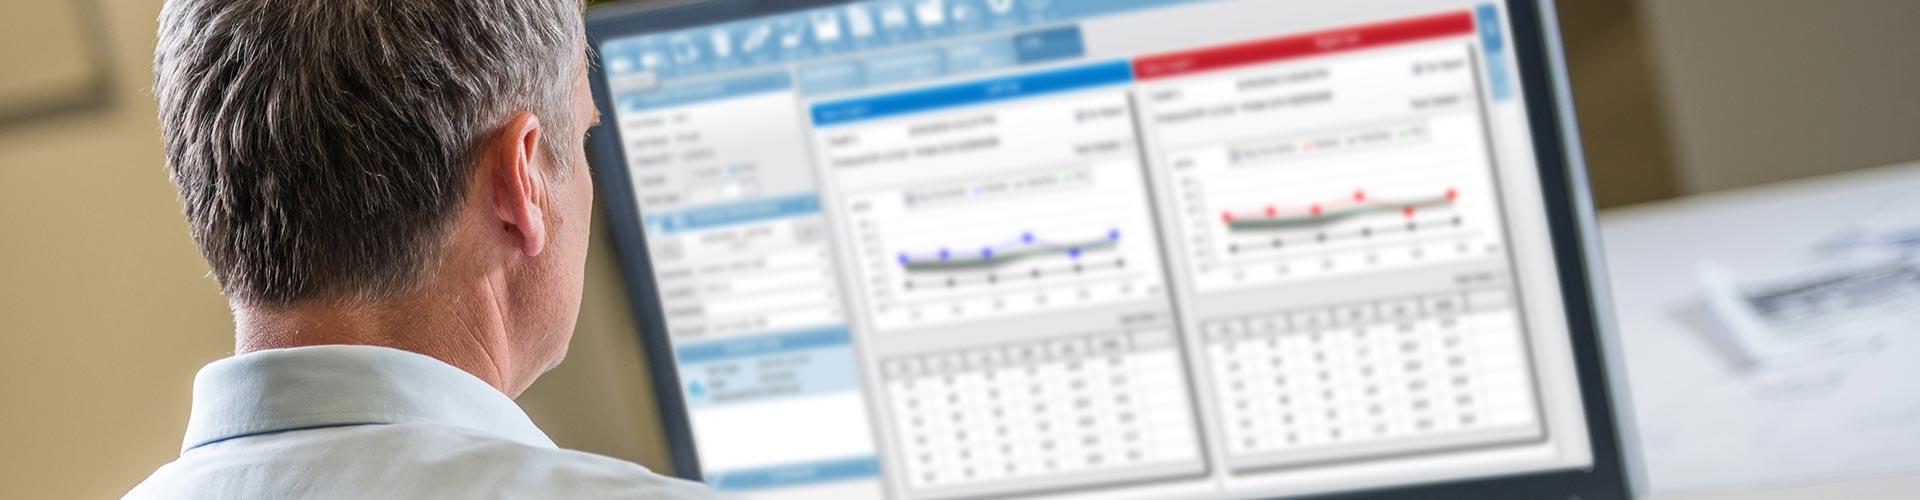 Otoacoustic Emissions Data Management